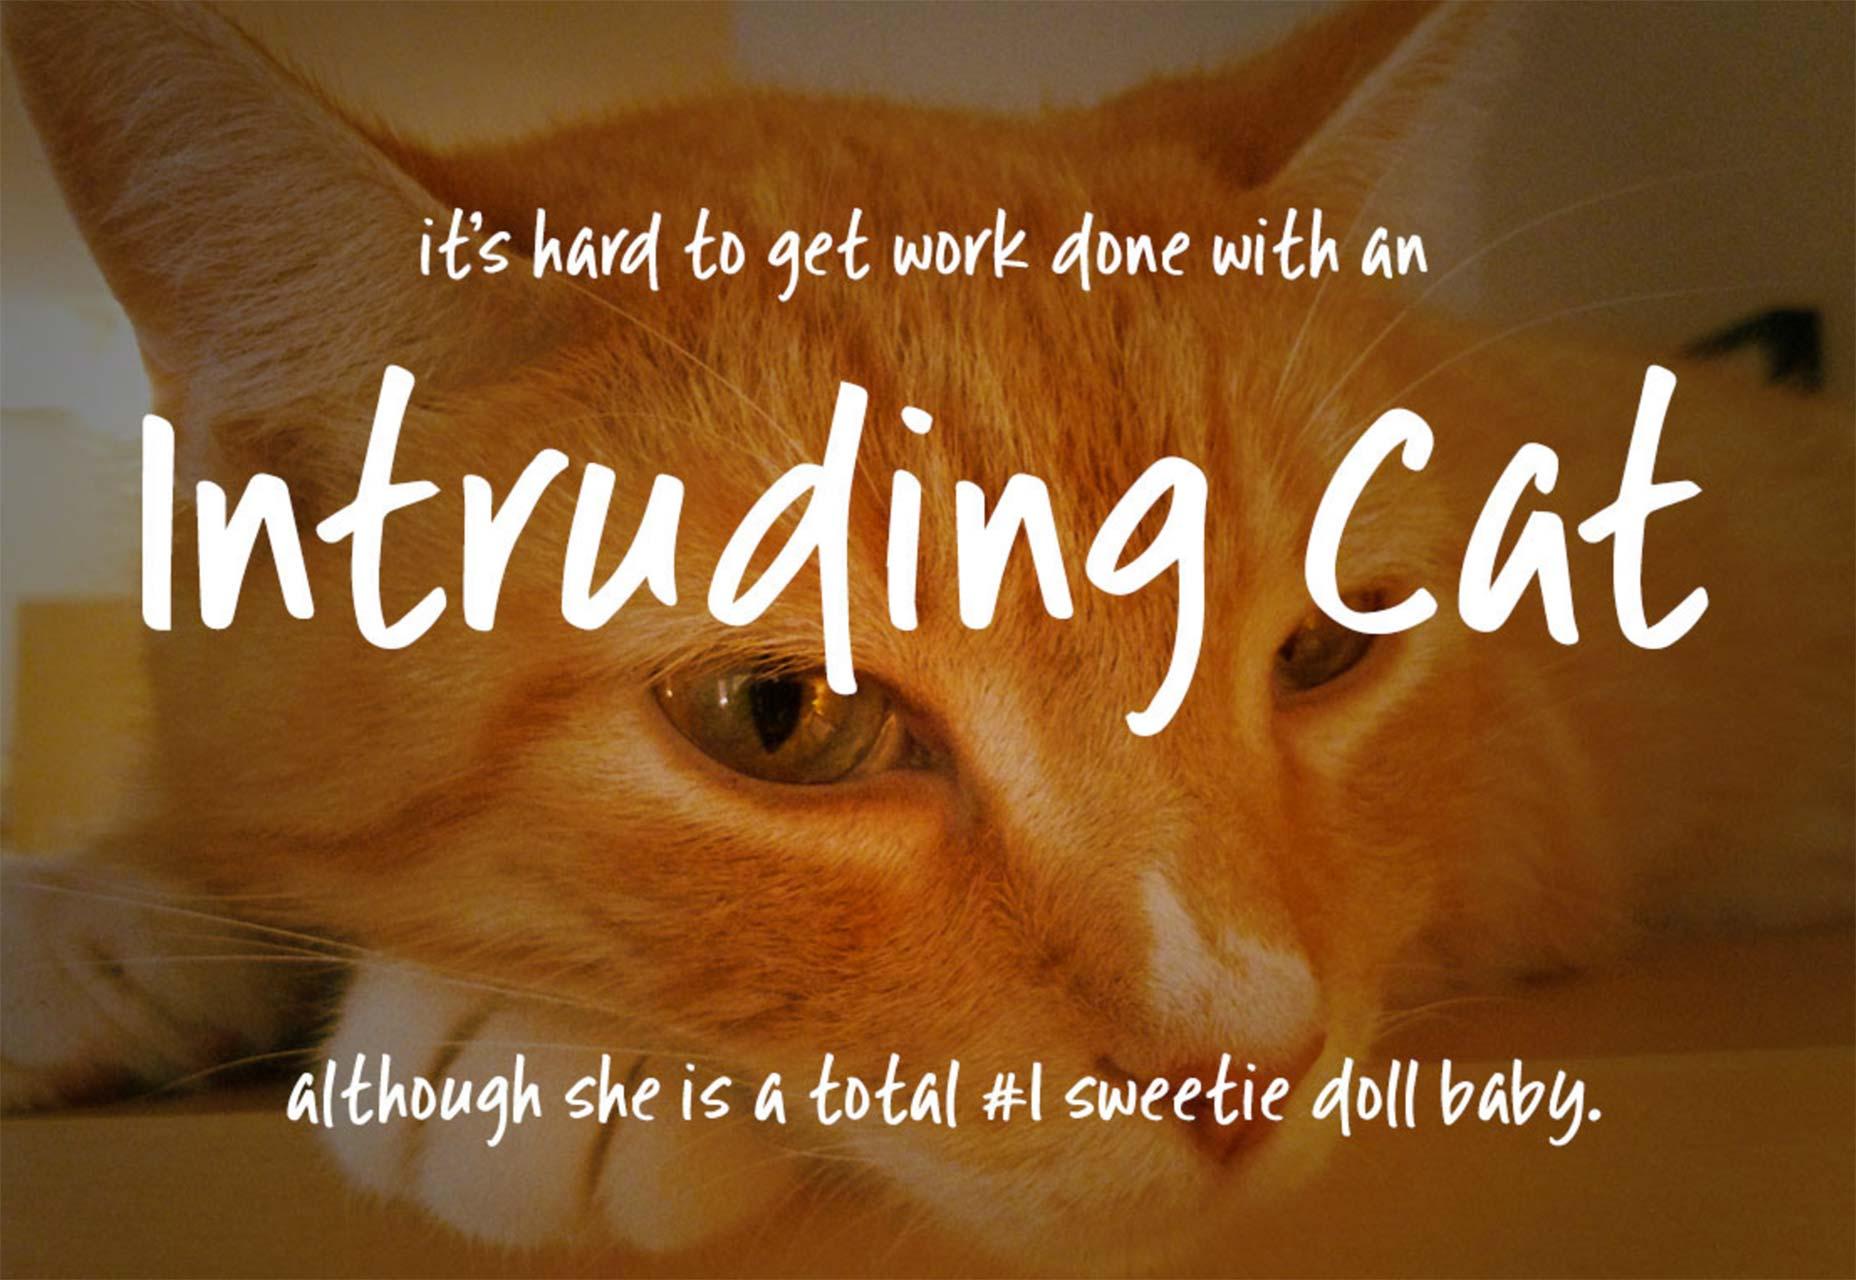 intrudingcat